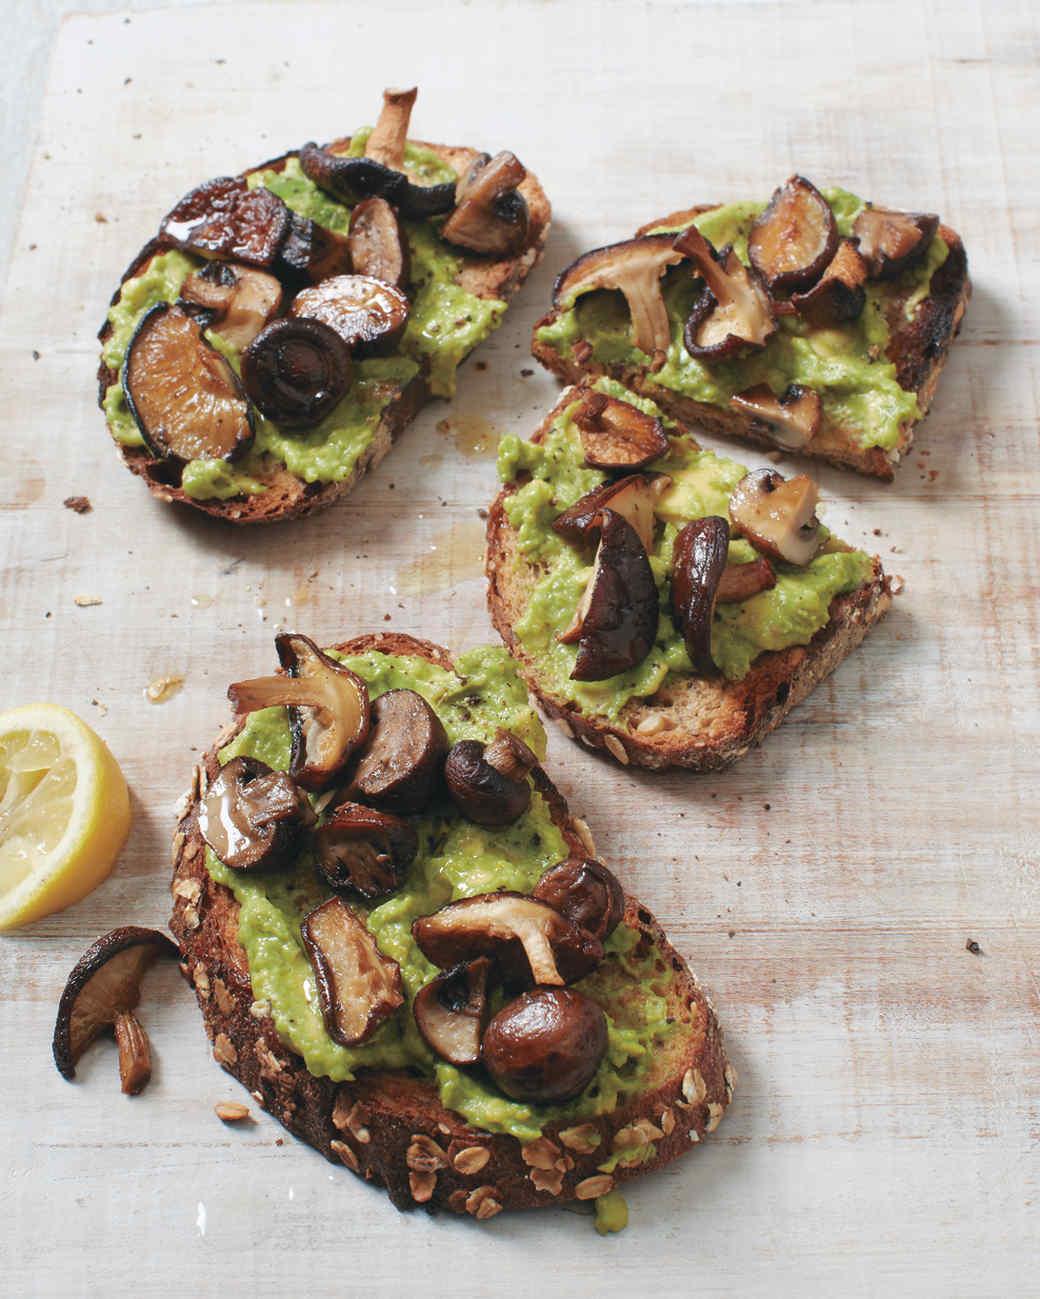 Roasted Mushroom Tartines with Avocado